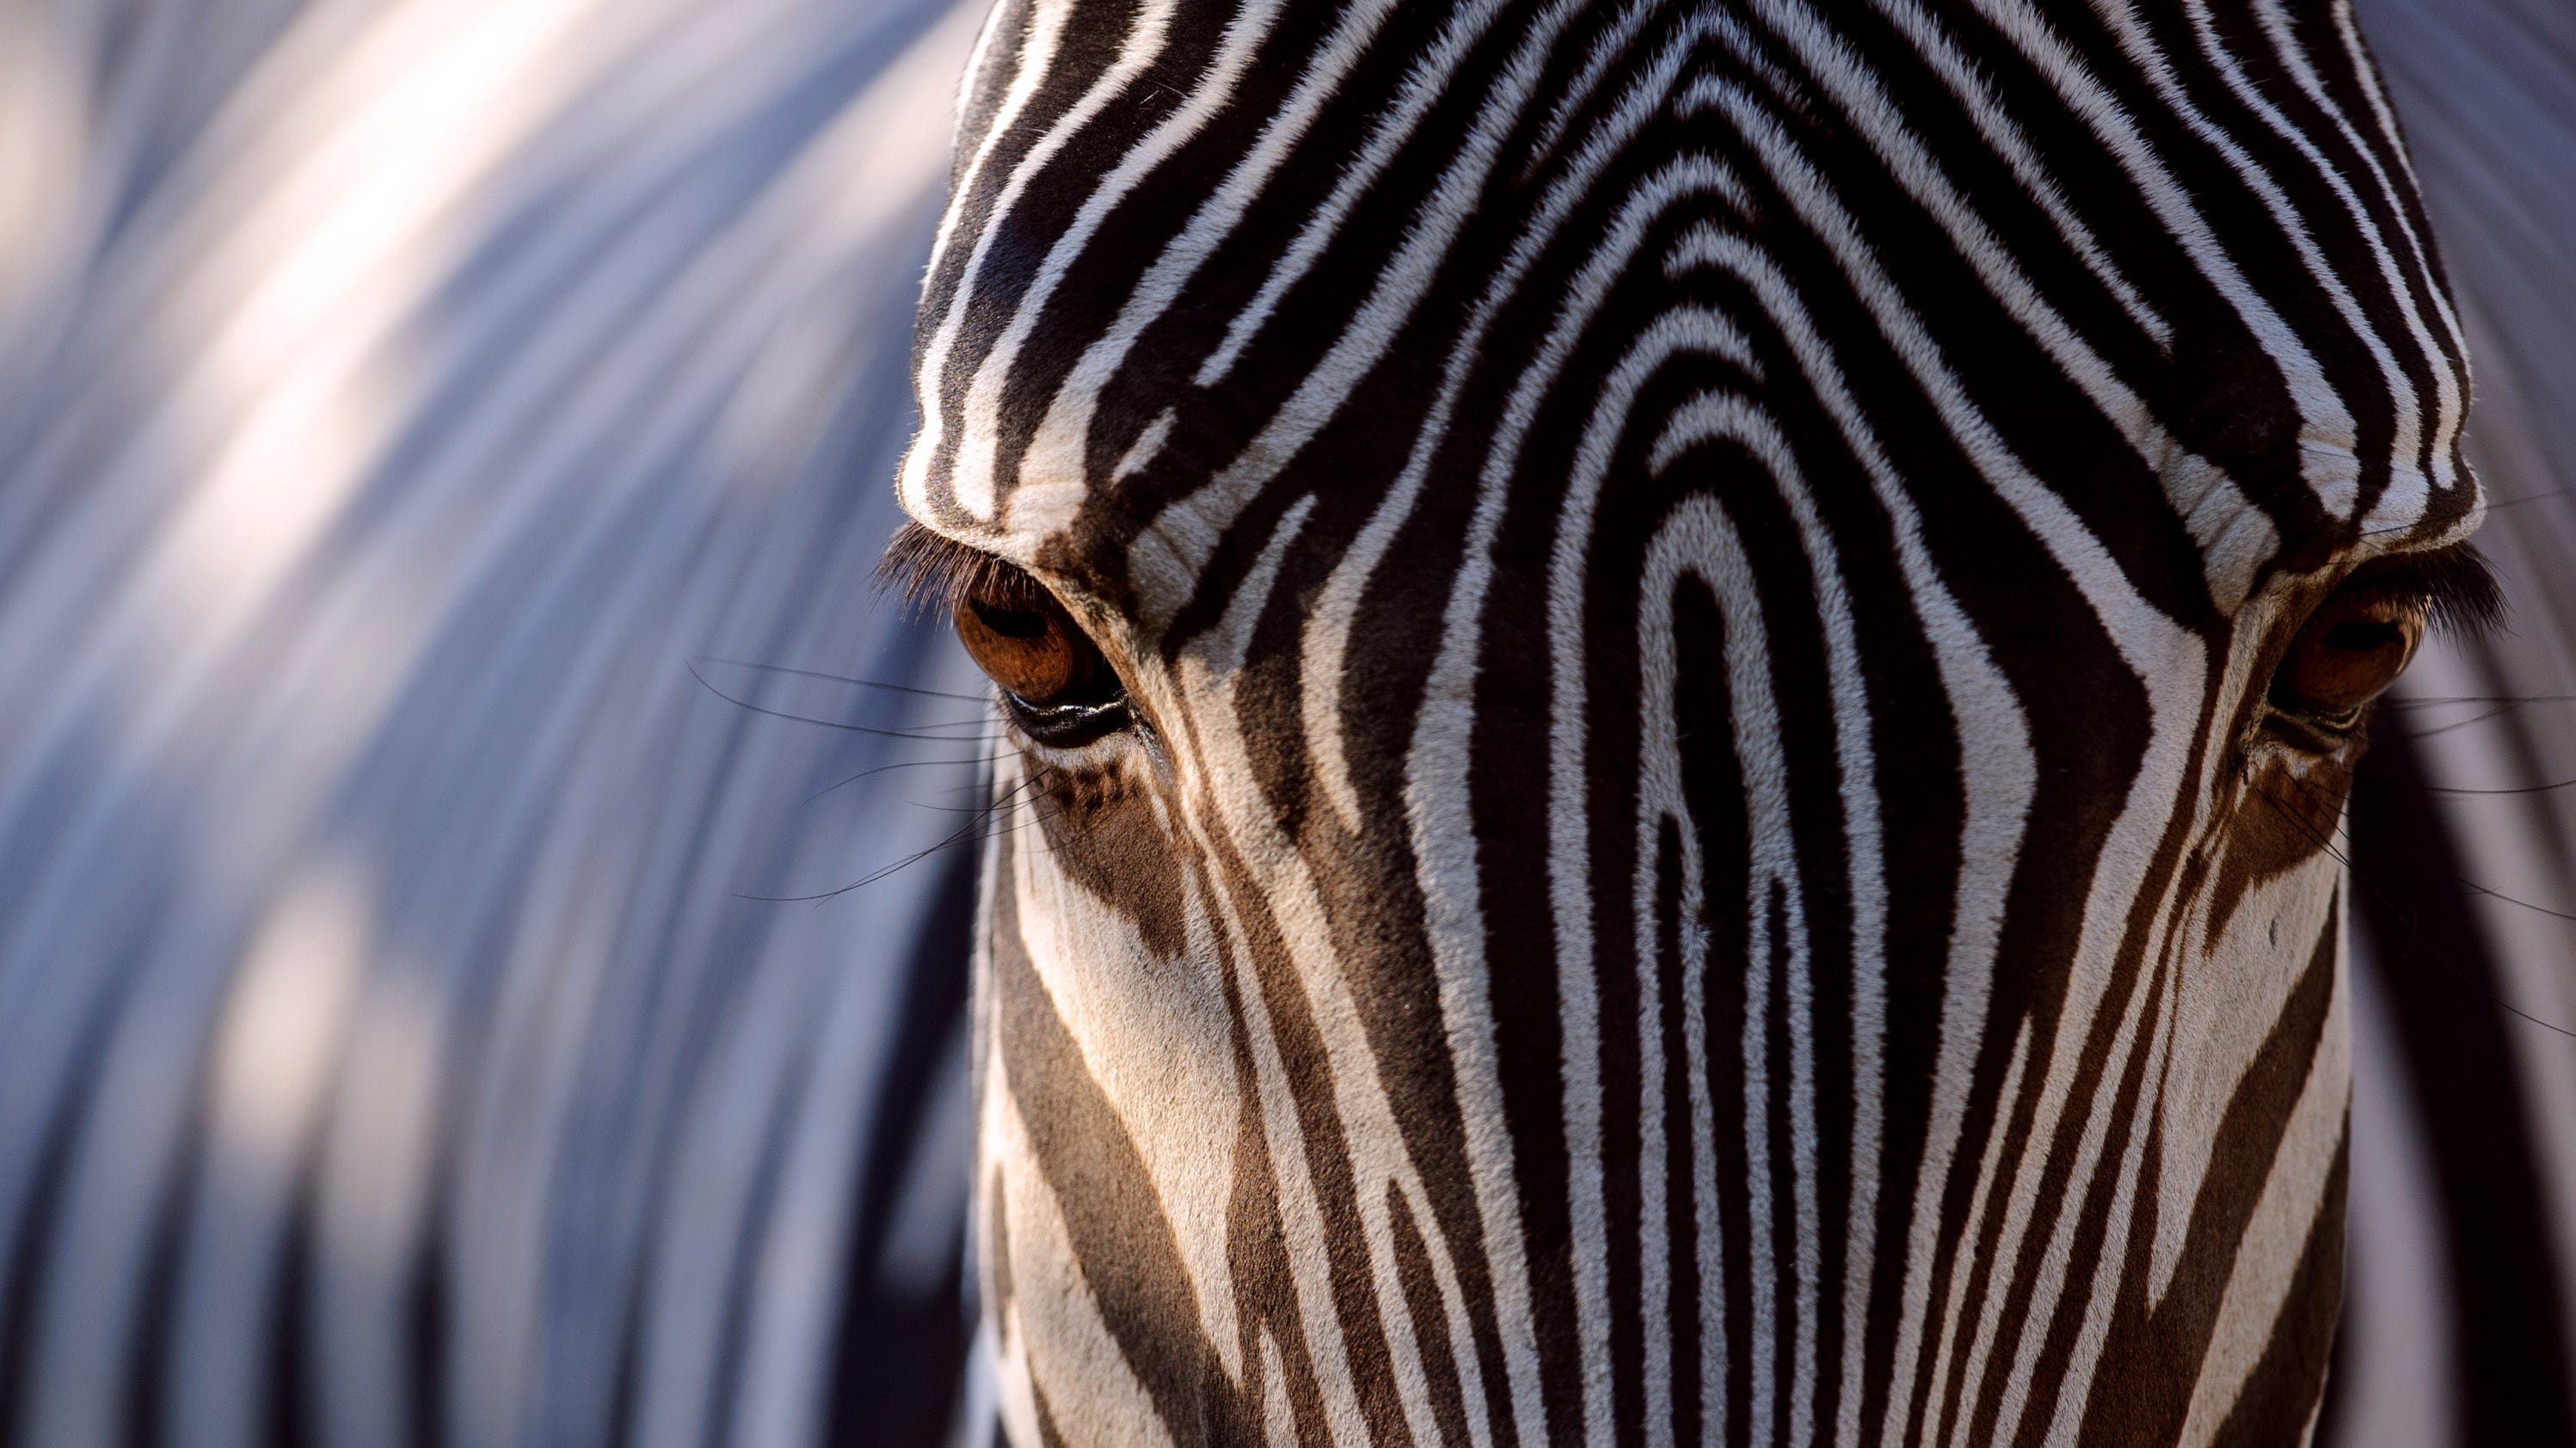 study zebra stripes help shoo flies